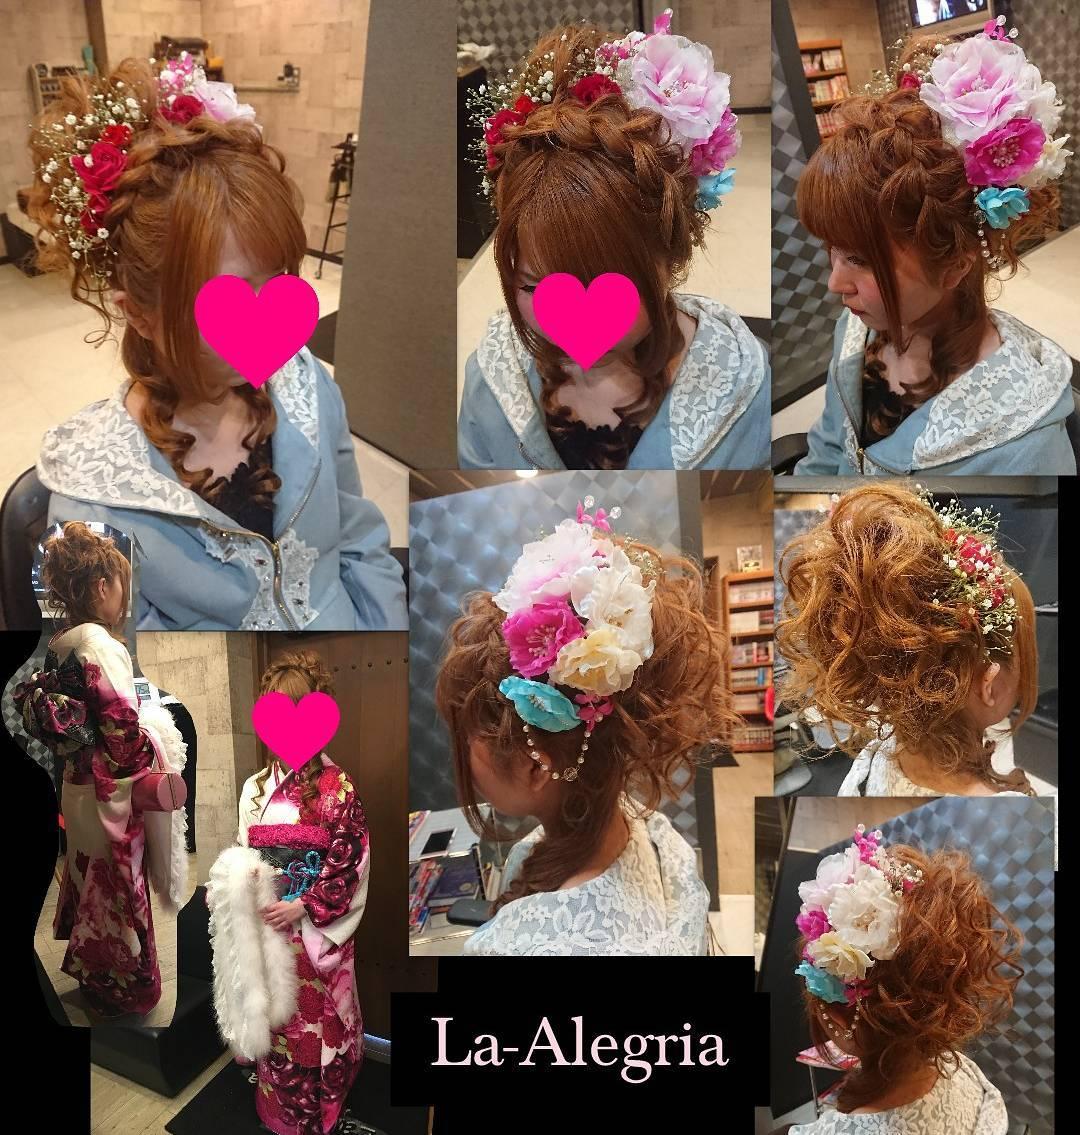 http://beauty-salon-la-alegria-ubecity.com/news/315.jpg